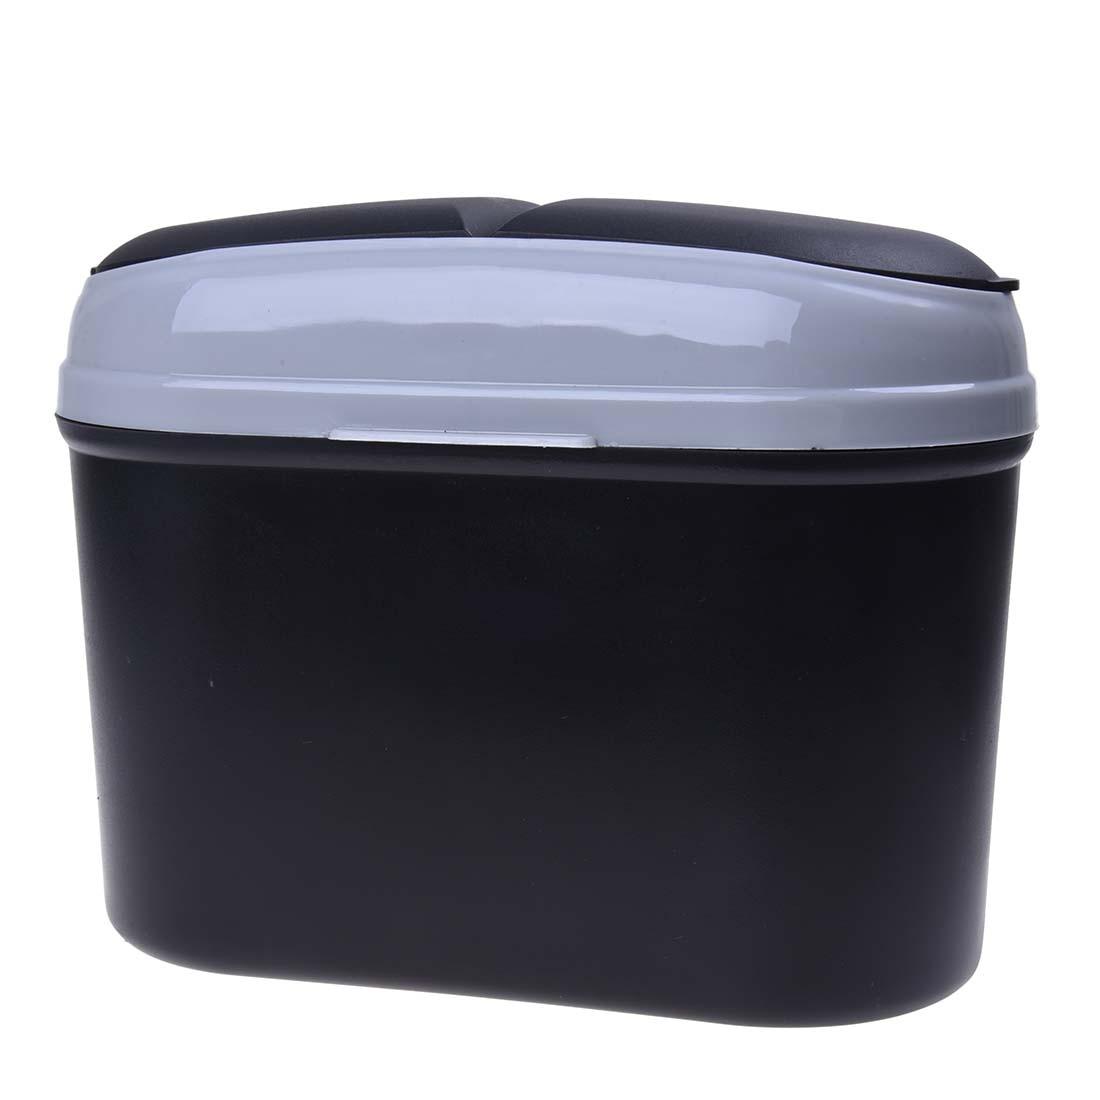 Mini Car Trash Rubbish Can Garbage Dust Case Holder Bin-black Grey